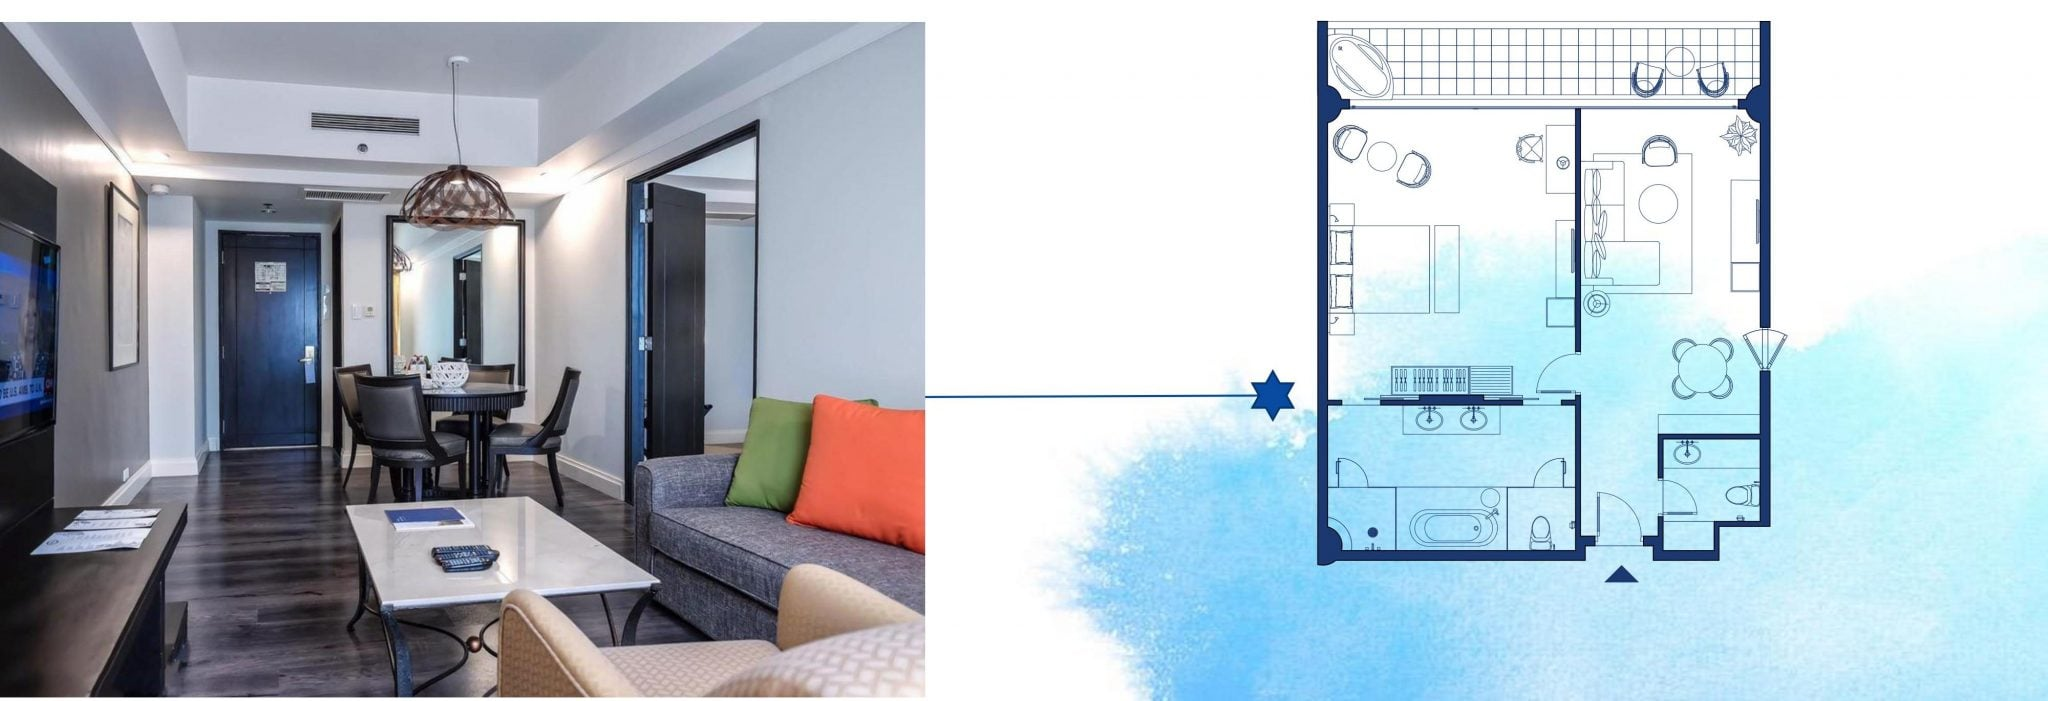 0050 e1563265823197 - Dự án căn hộ condotel Cam Ranh Bay - Pearl Cam Ranh